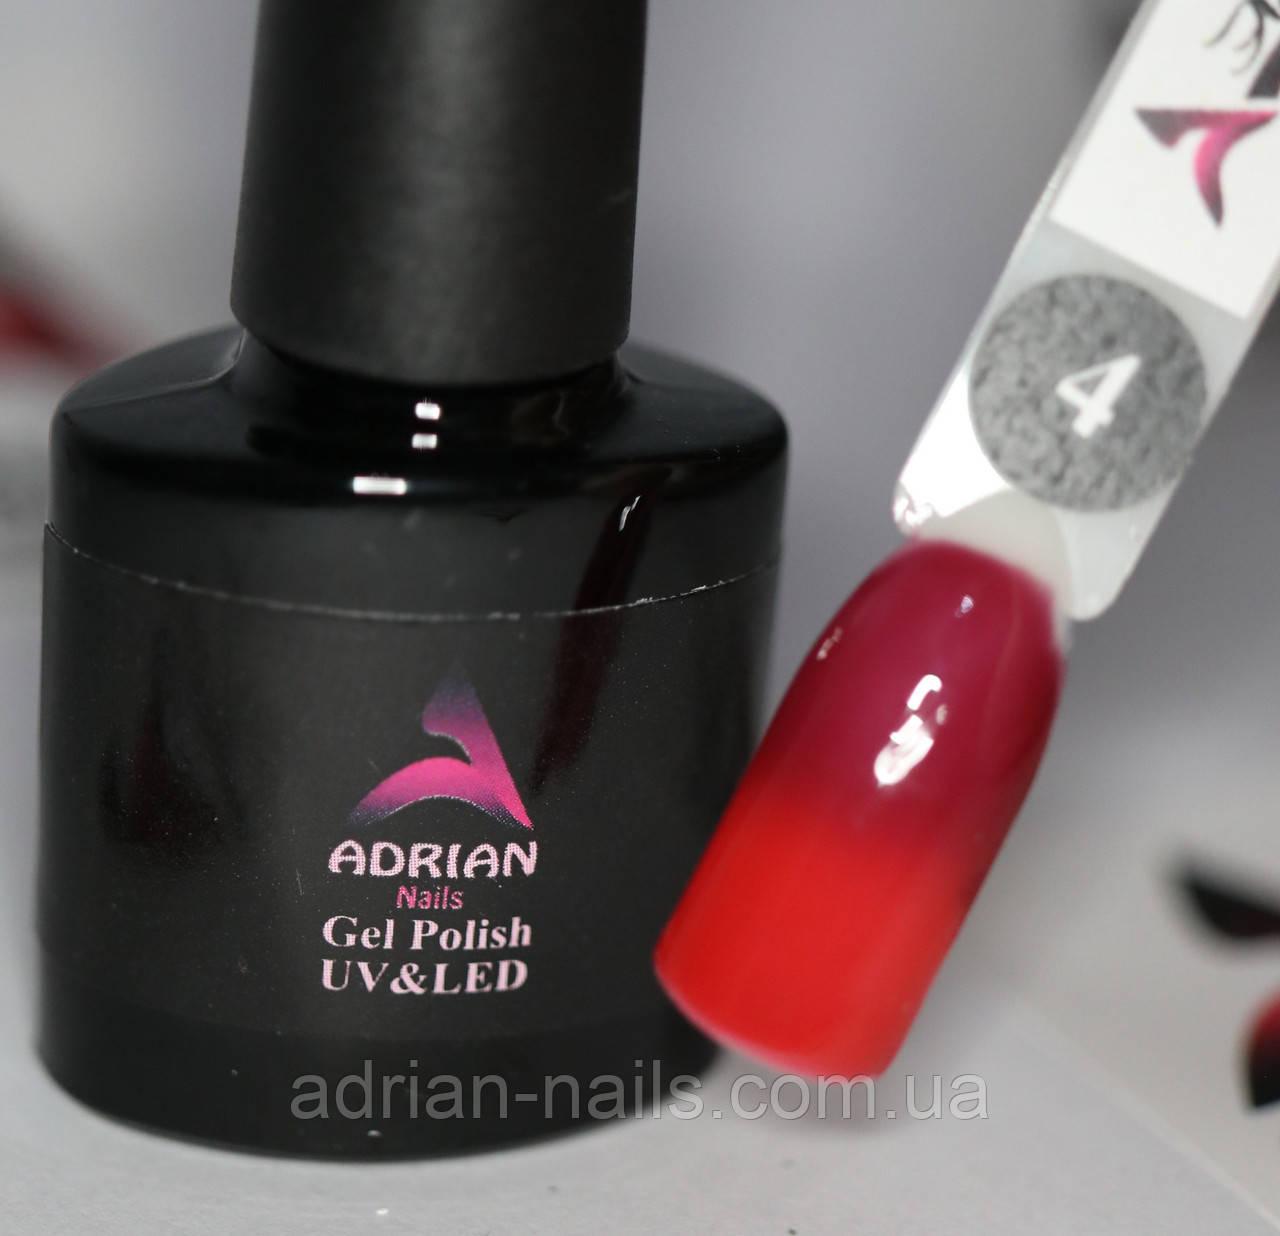 Термо Гель-лак Adrian Nails 10ml - №4